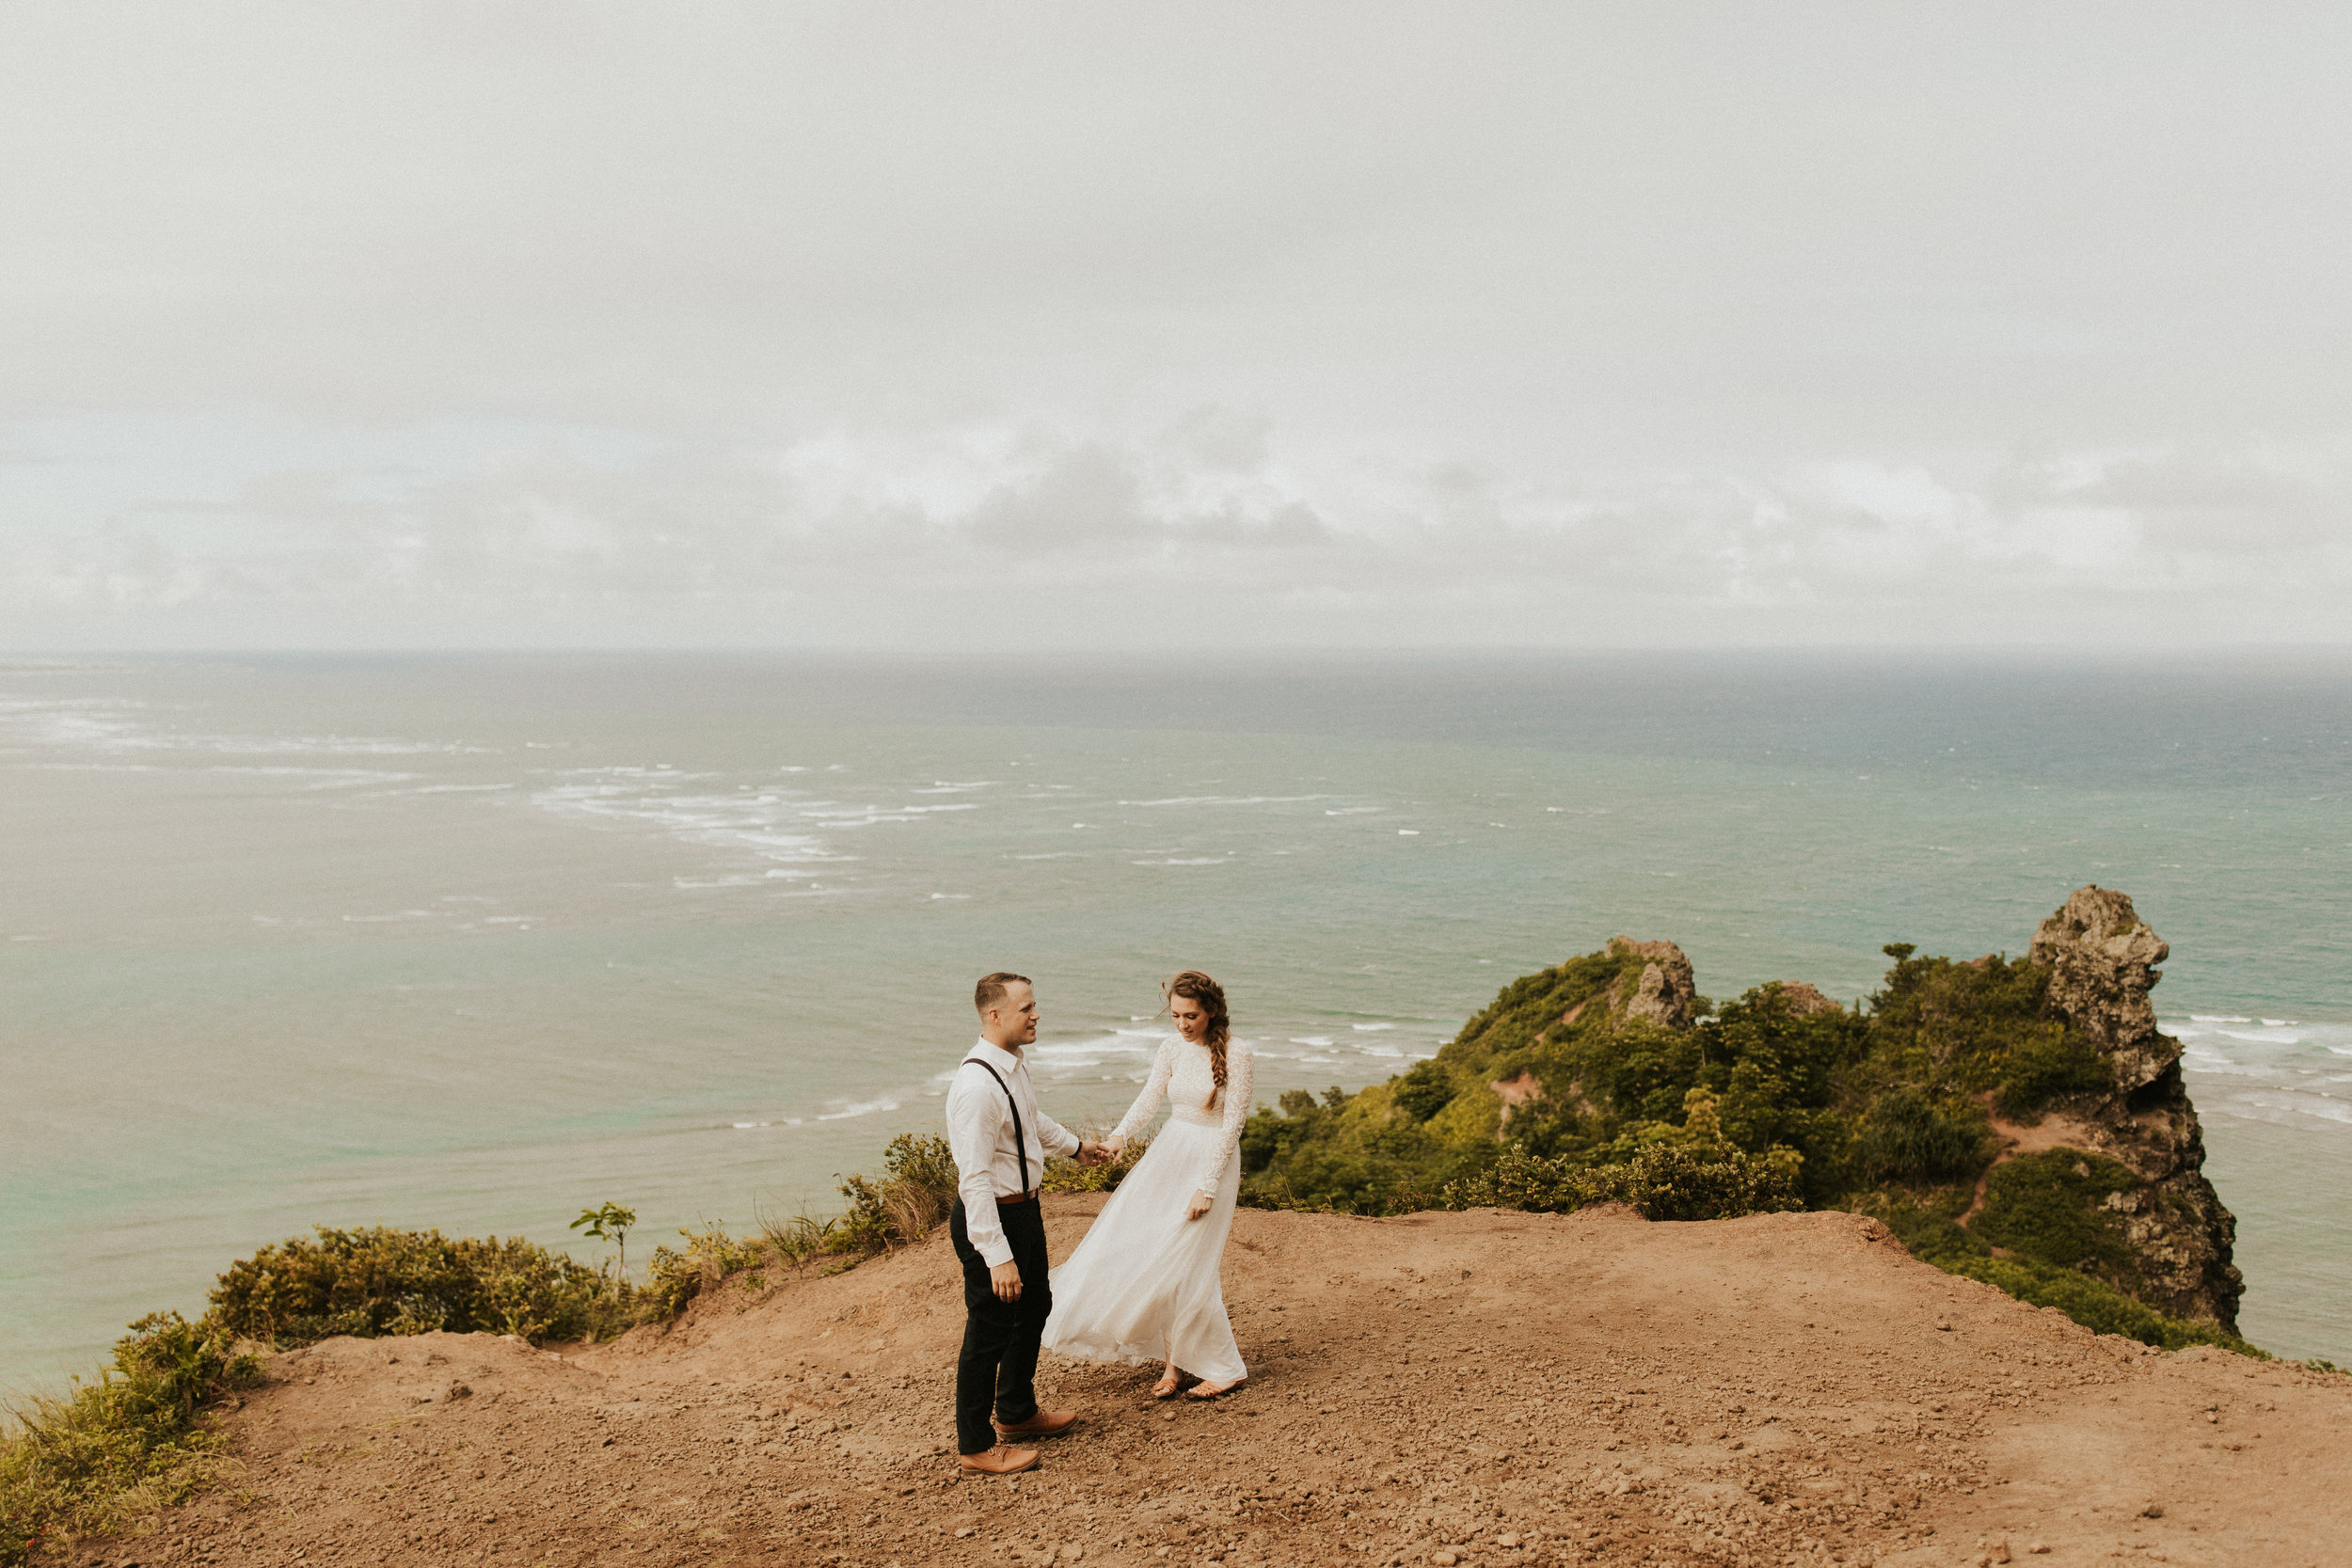 the-mclachlans-destination-elopement-photographers-mountain-hike-sena-eric-40.jpg